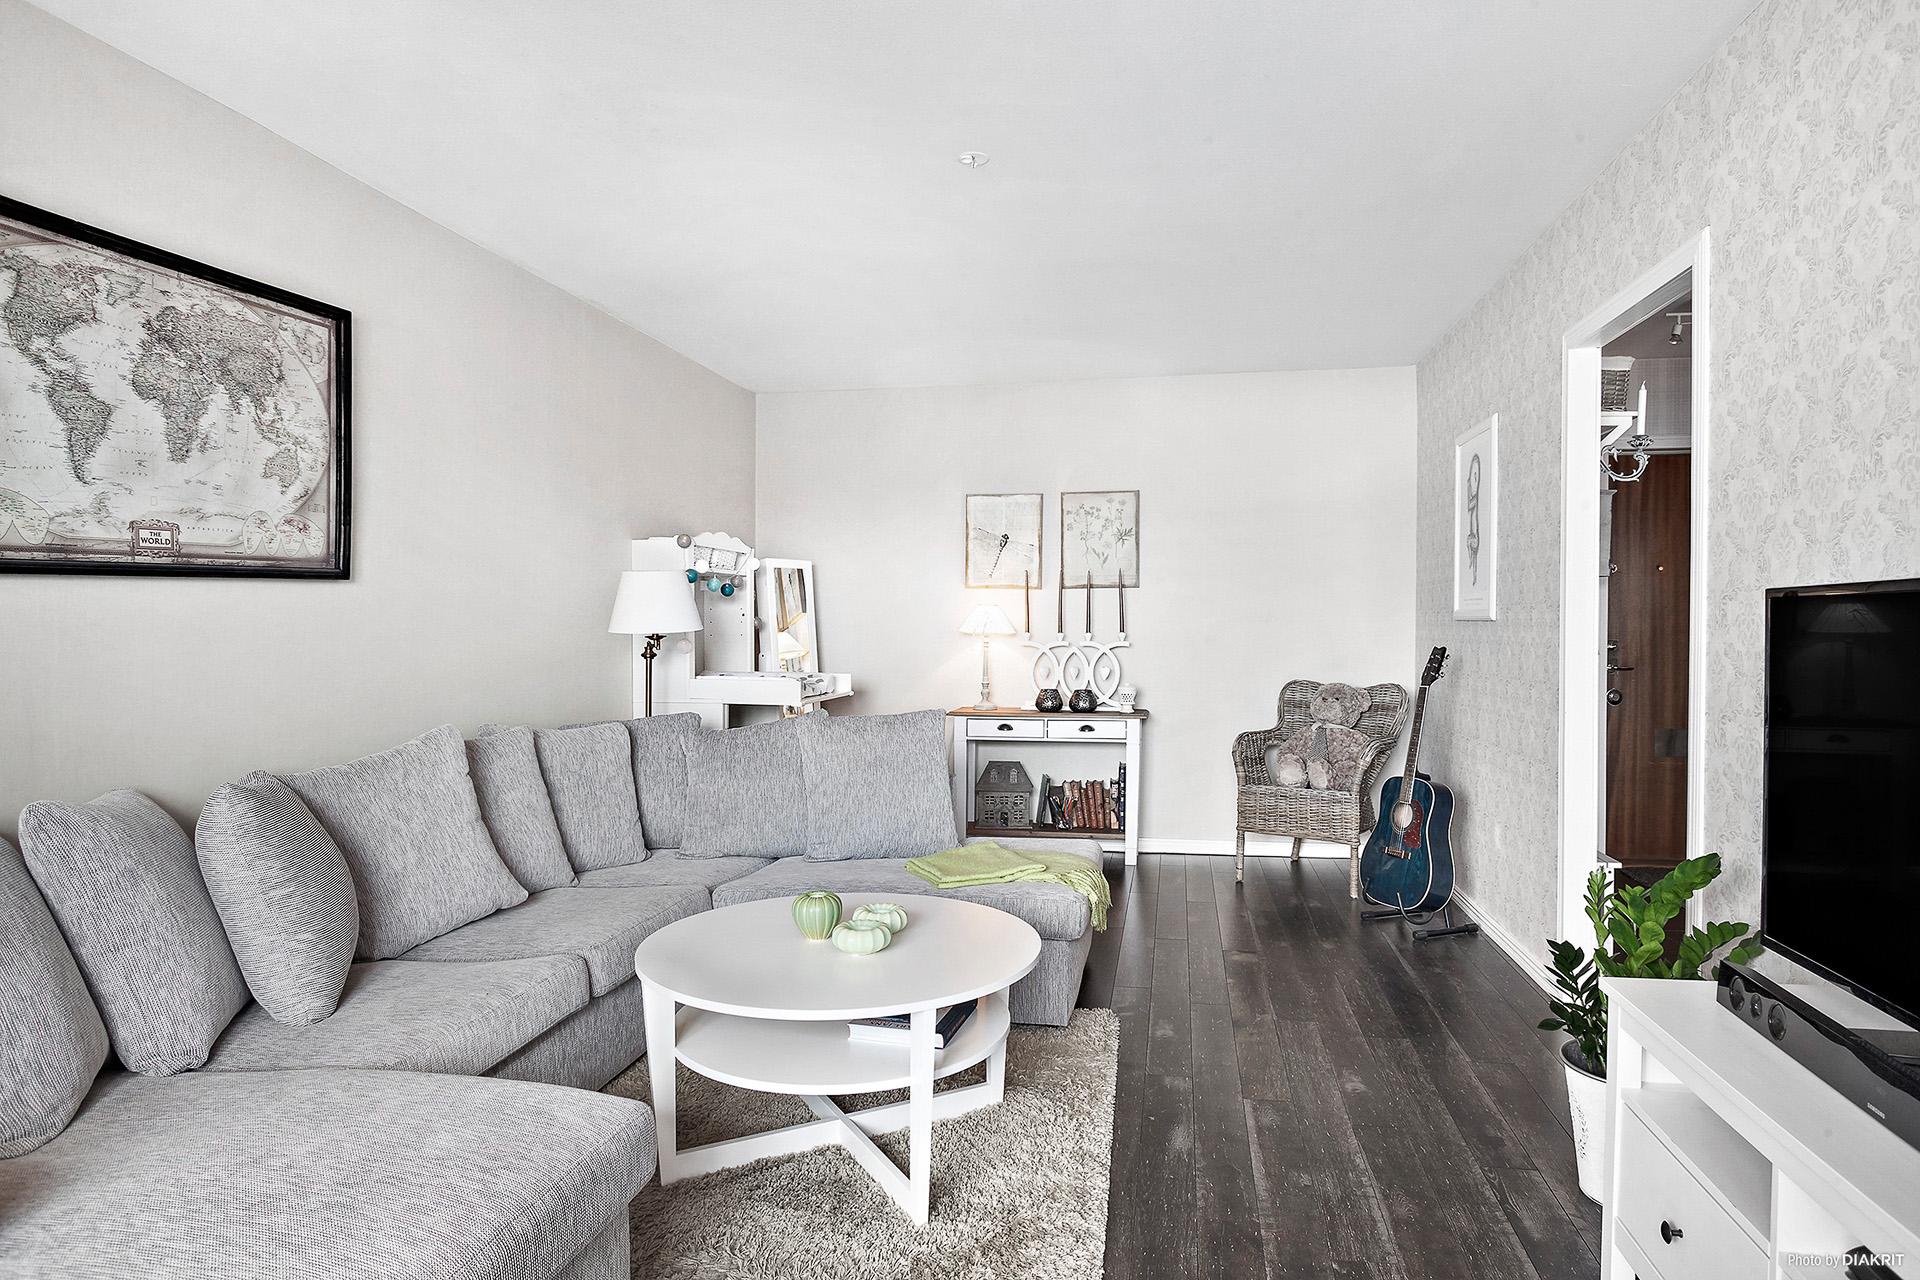 Rummet kan delas av om ett mindre sovrum behövs